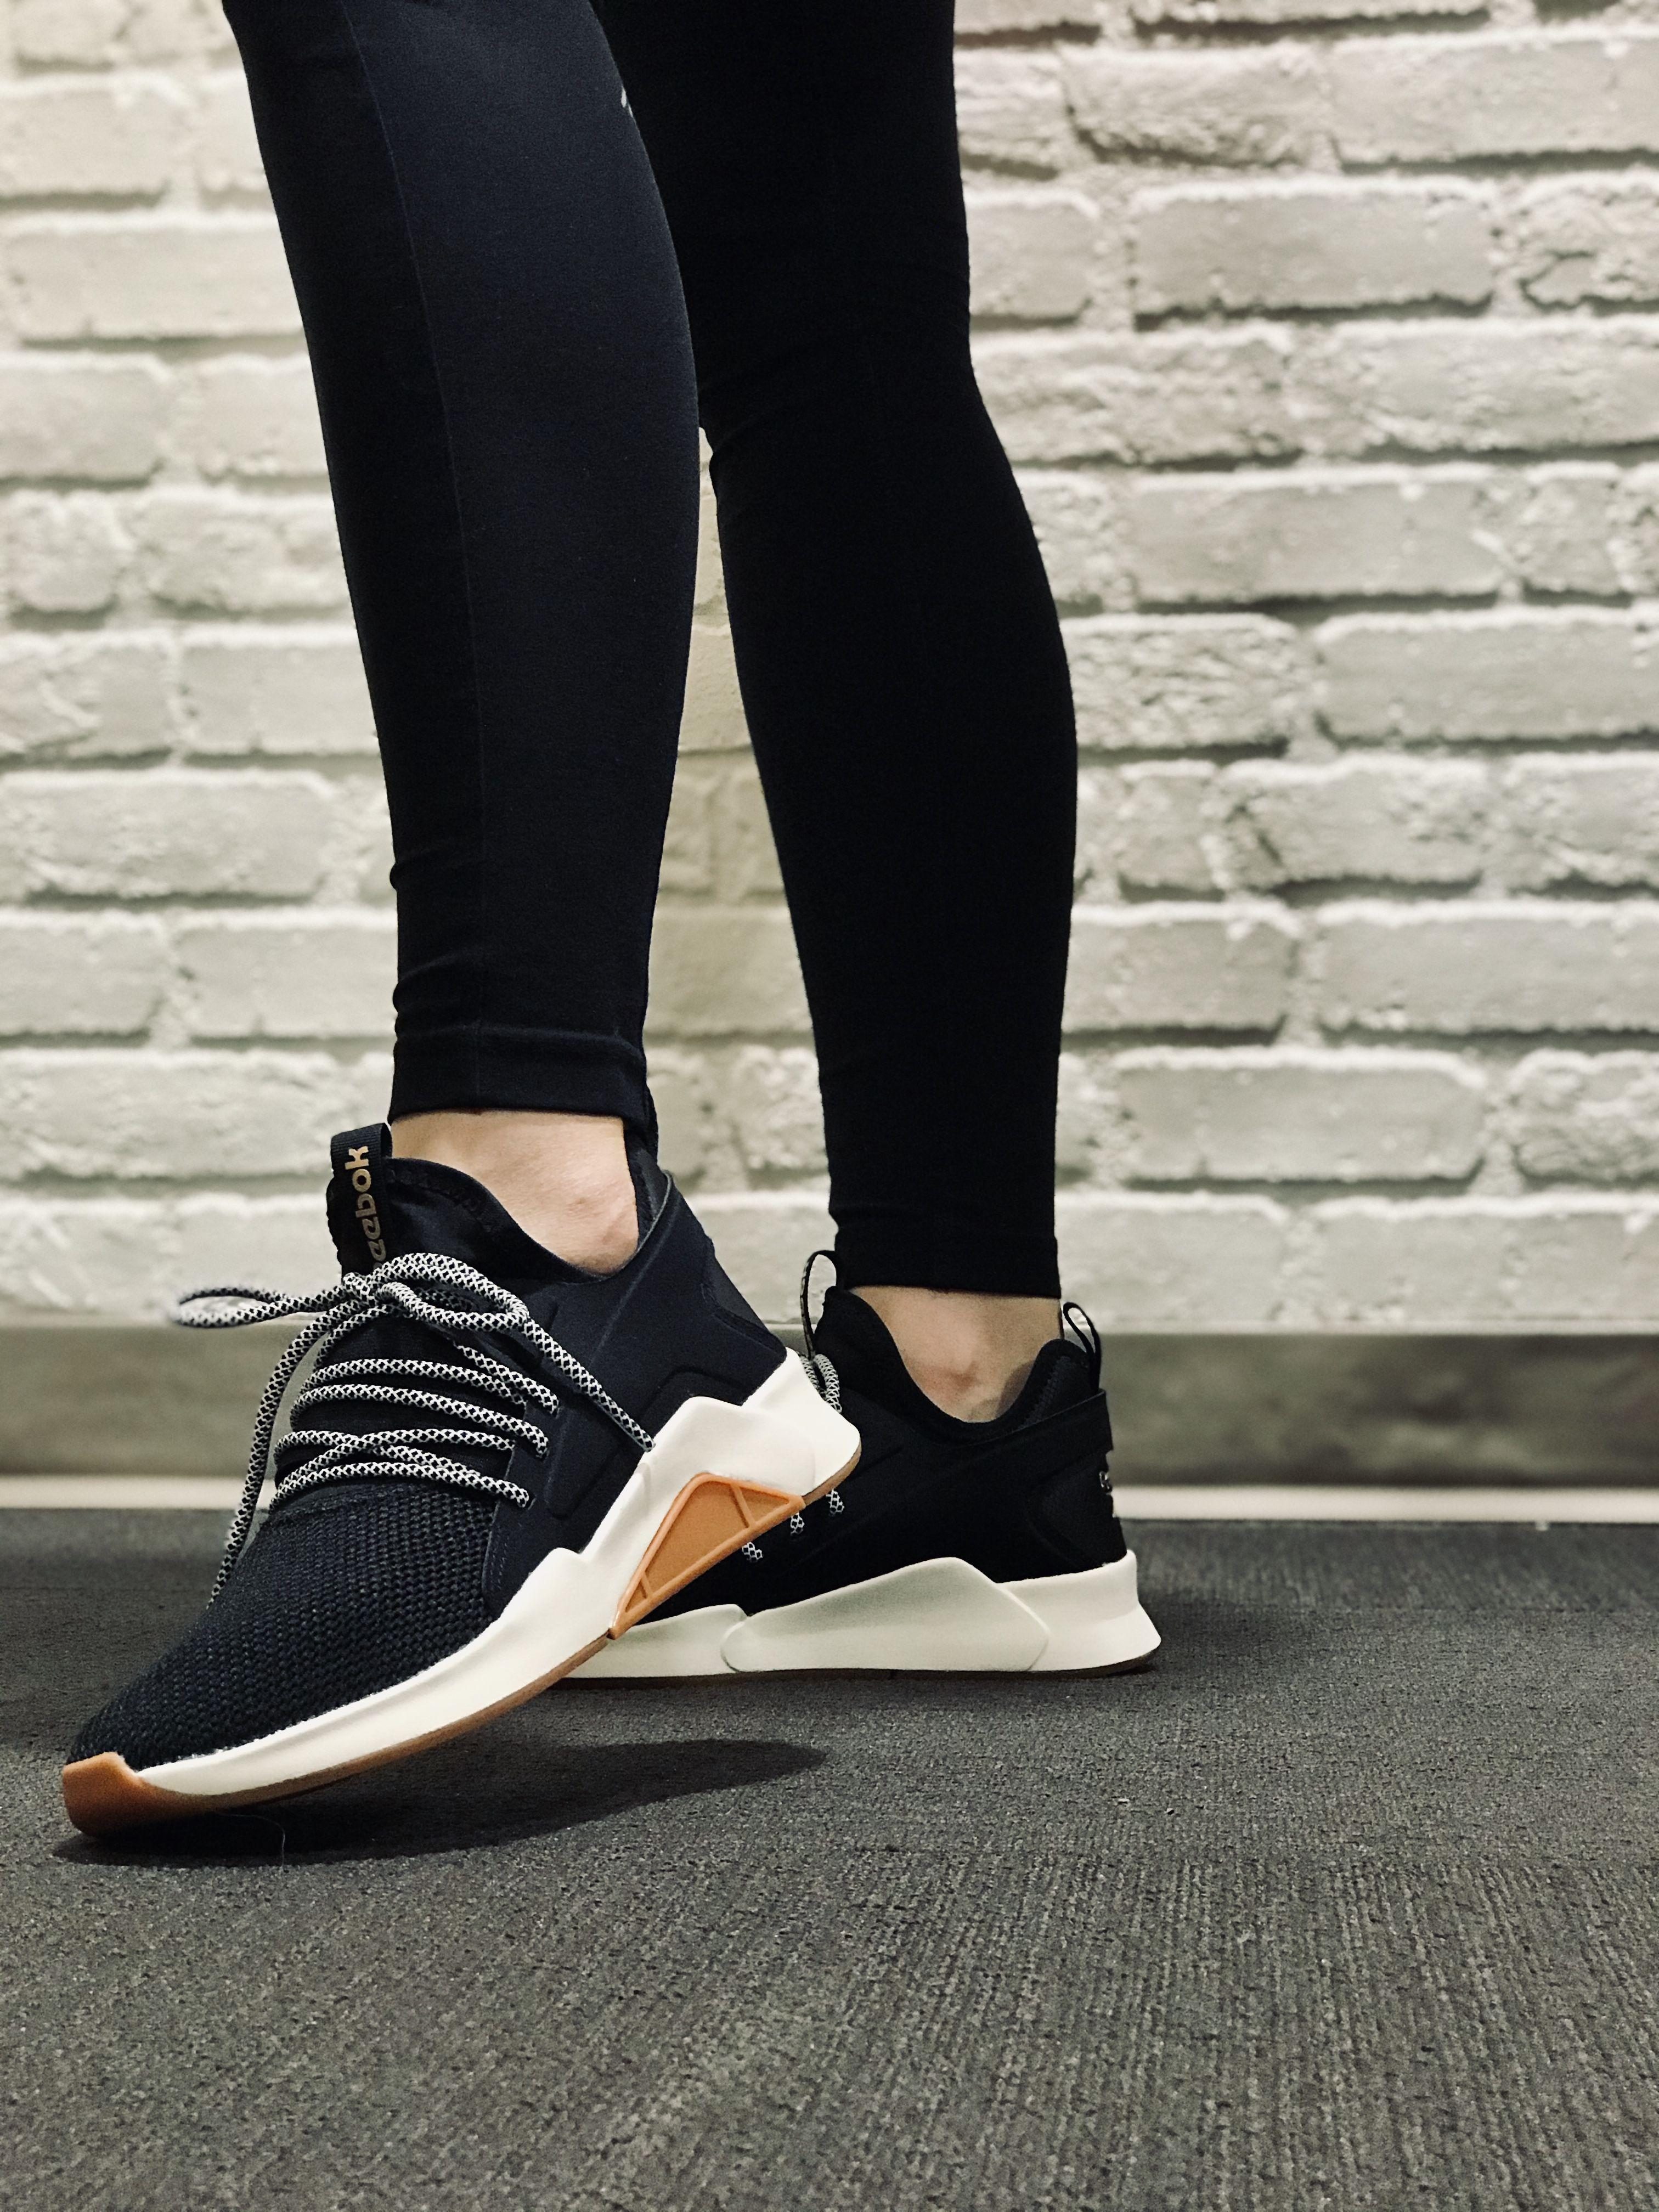 Women's Guresu 2.0 Dance Shoe in 2020